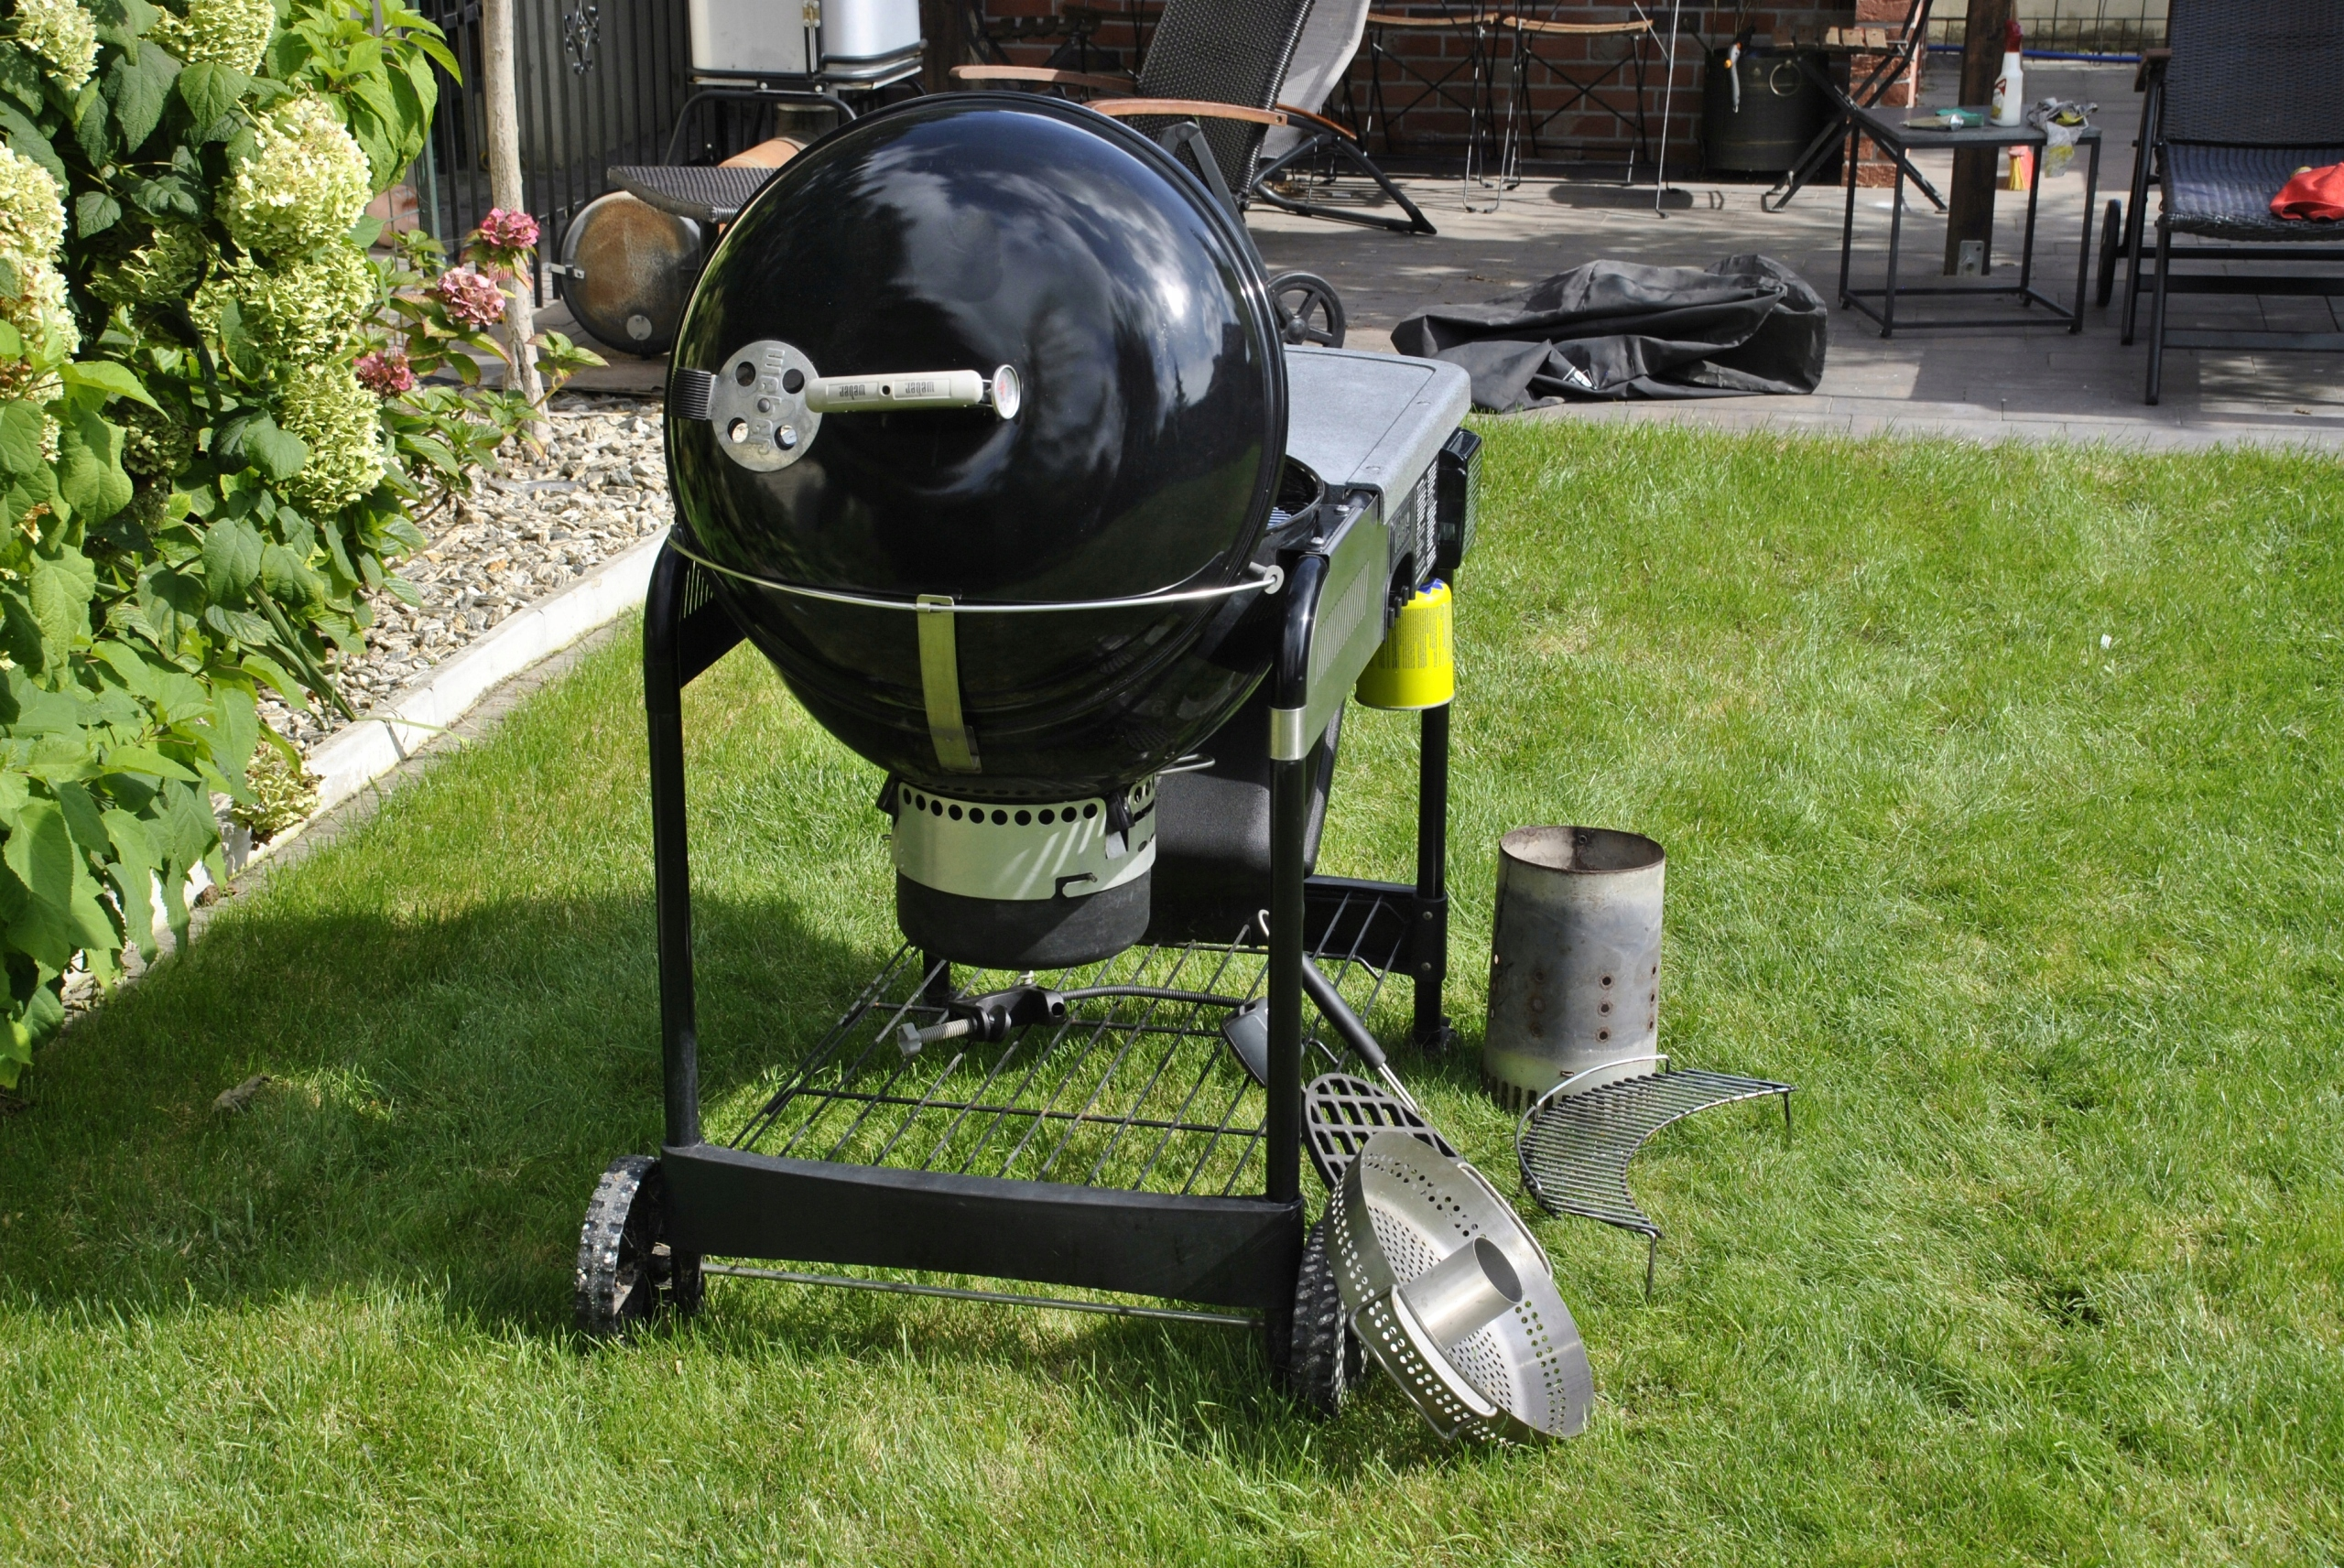 Weber Holzkohlegrill Performer Deluxe Gbs : Weber grill performer deluxe gbs gourmet akcesoria 7545051980